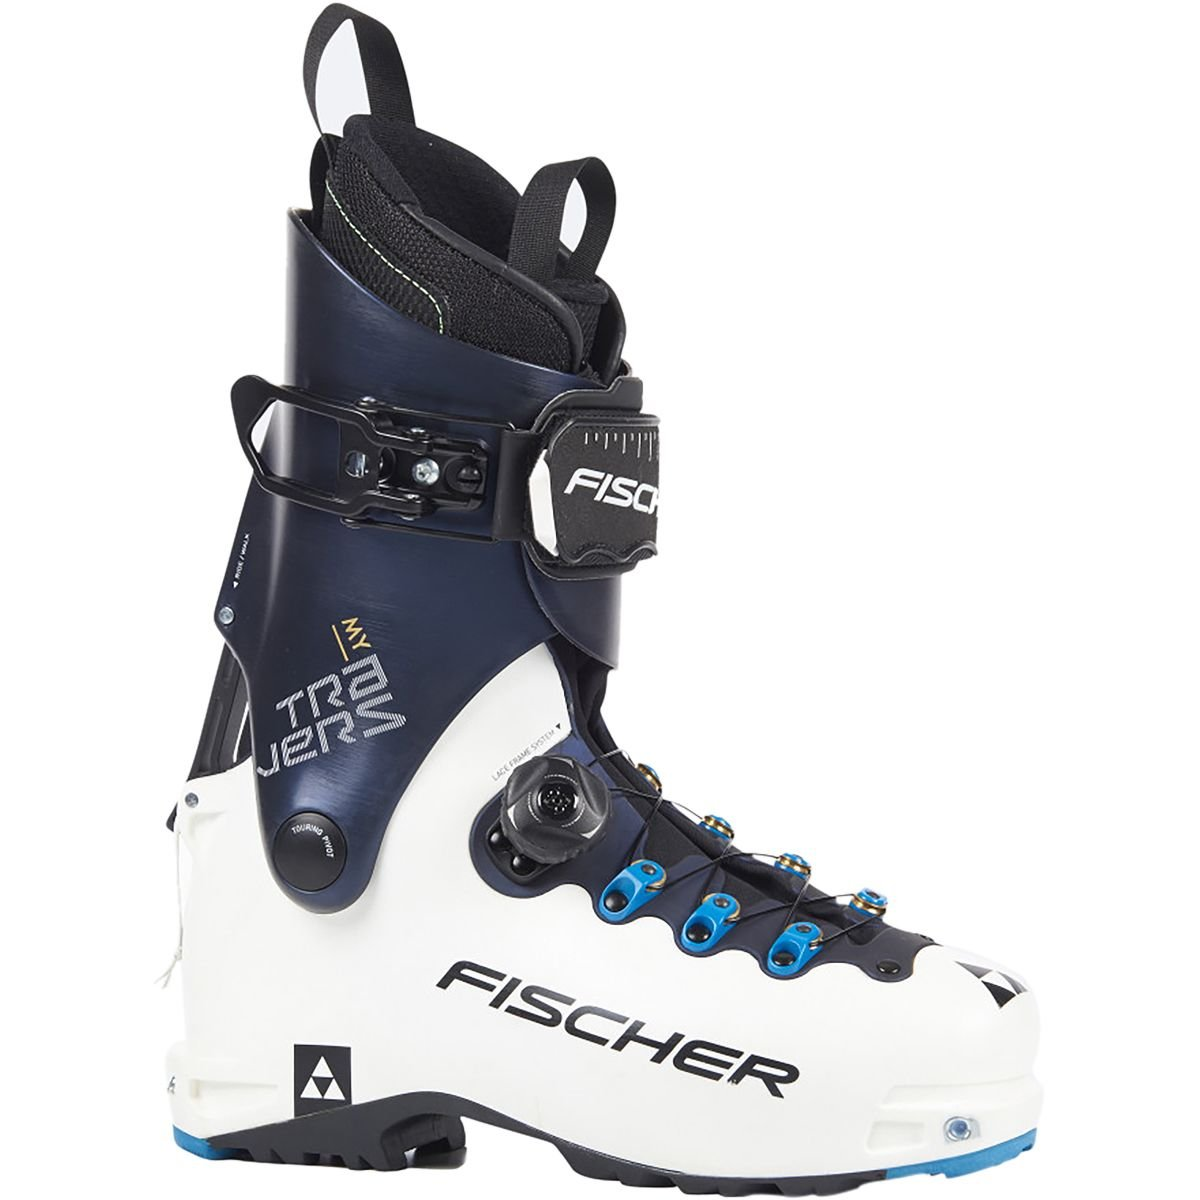 Fischer My Travers レディース スキーブーツ ホワイト/ダークブルー 27.5